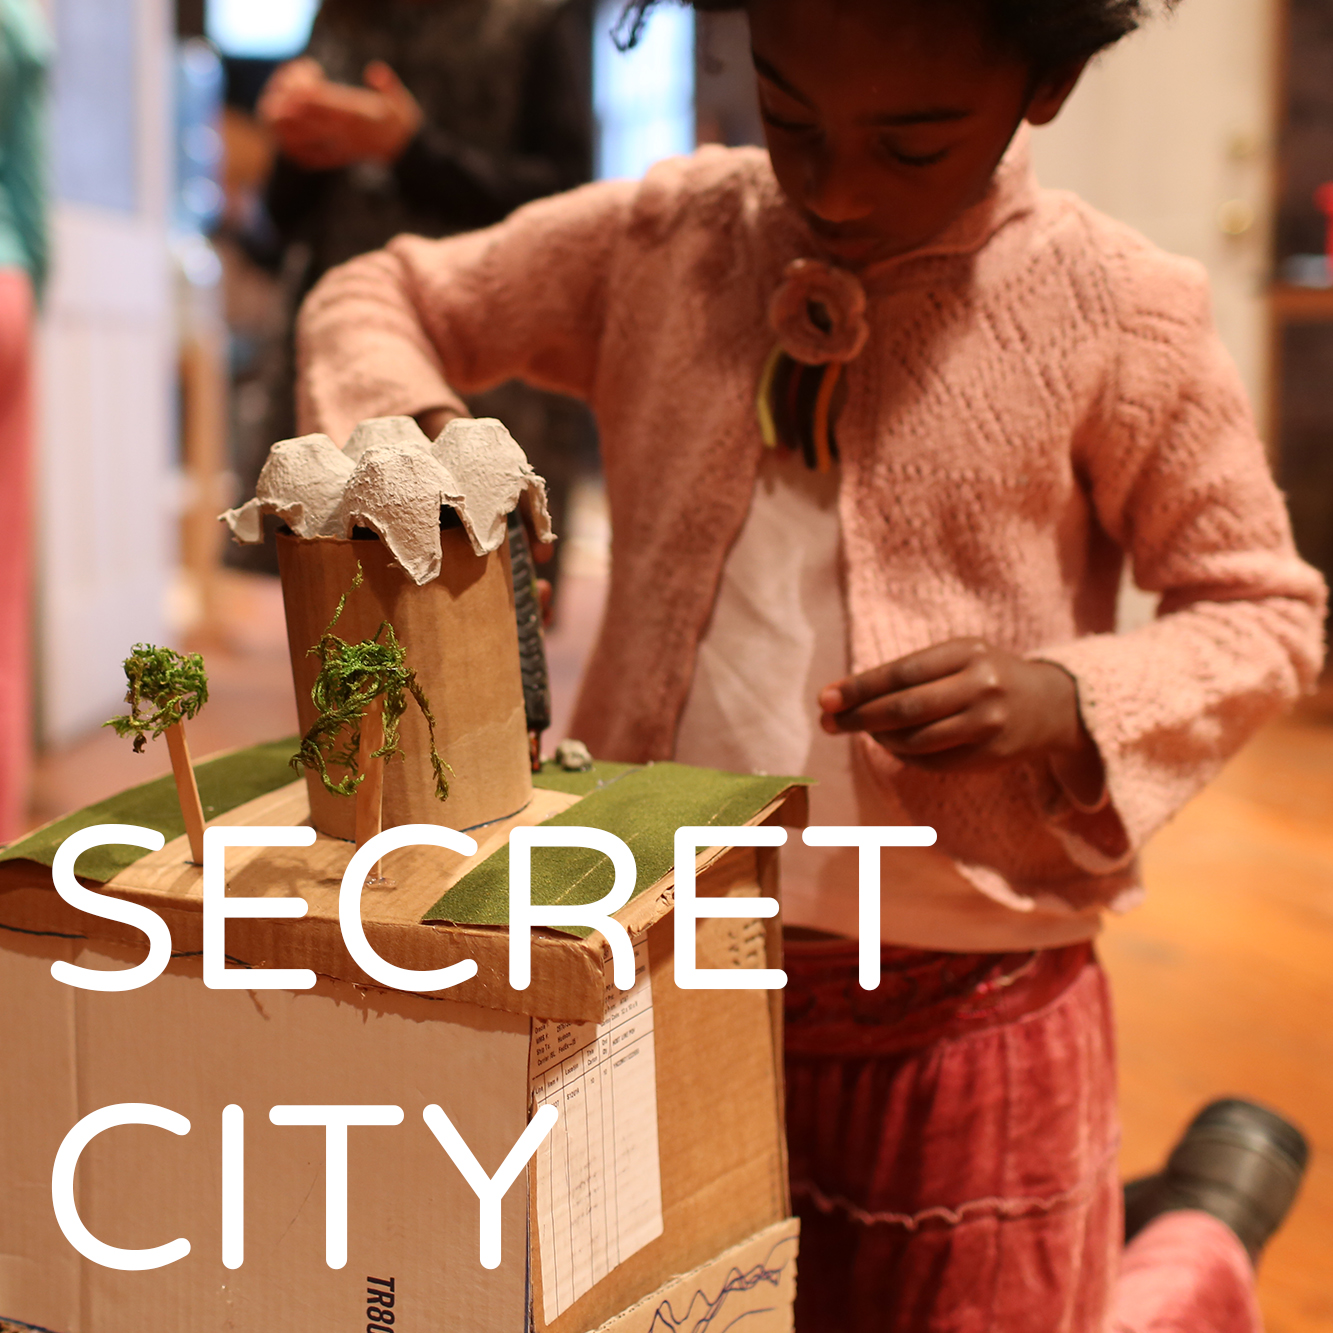 SecretCity2.jpg